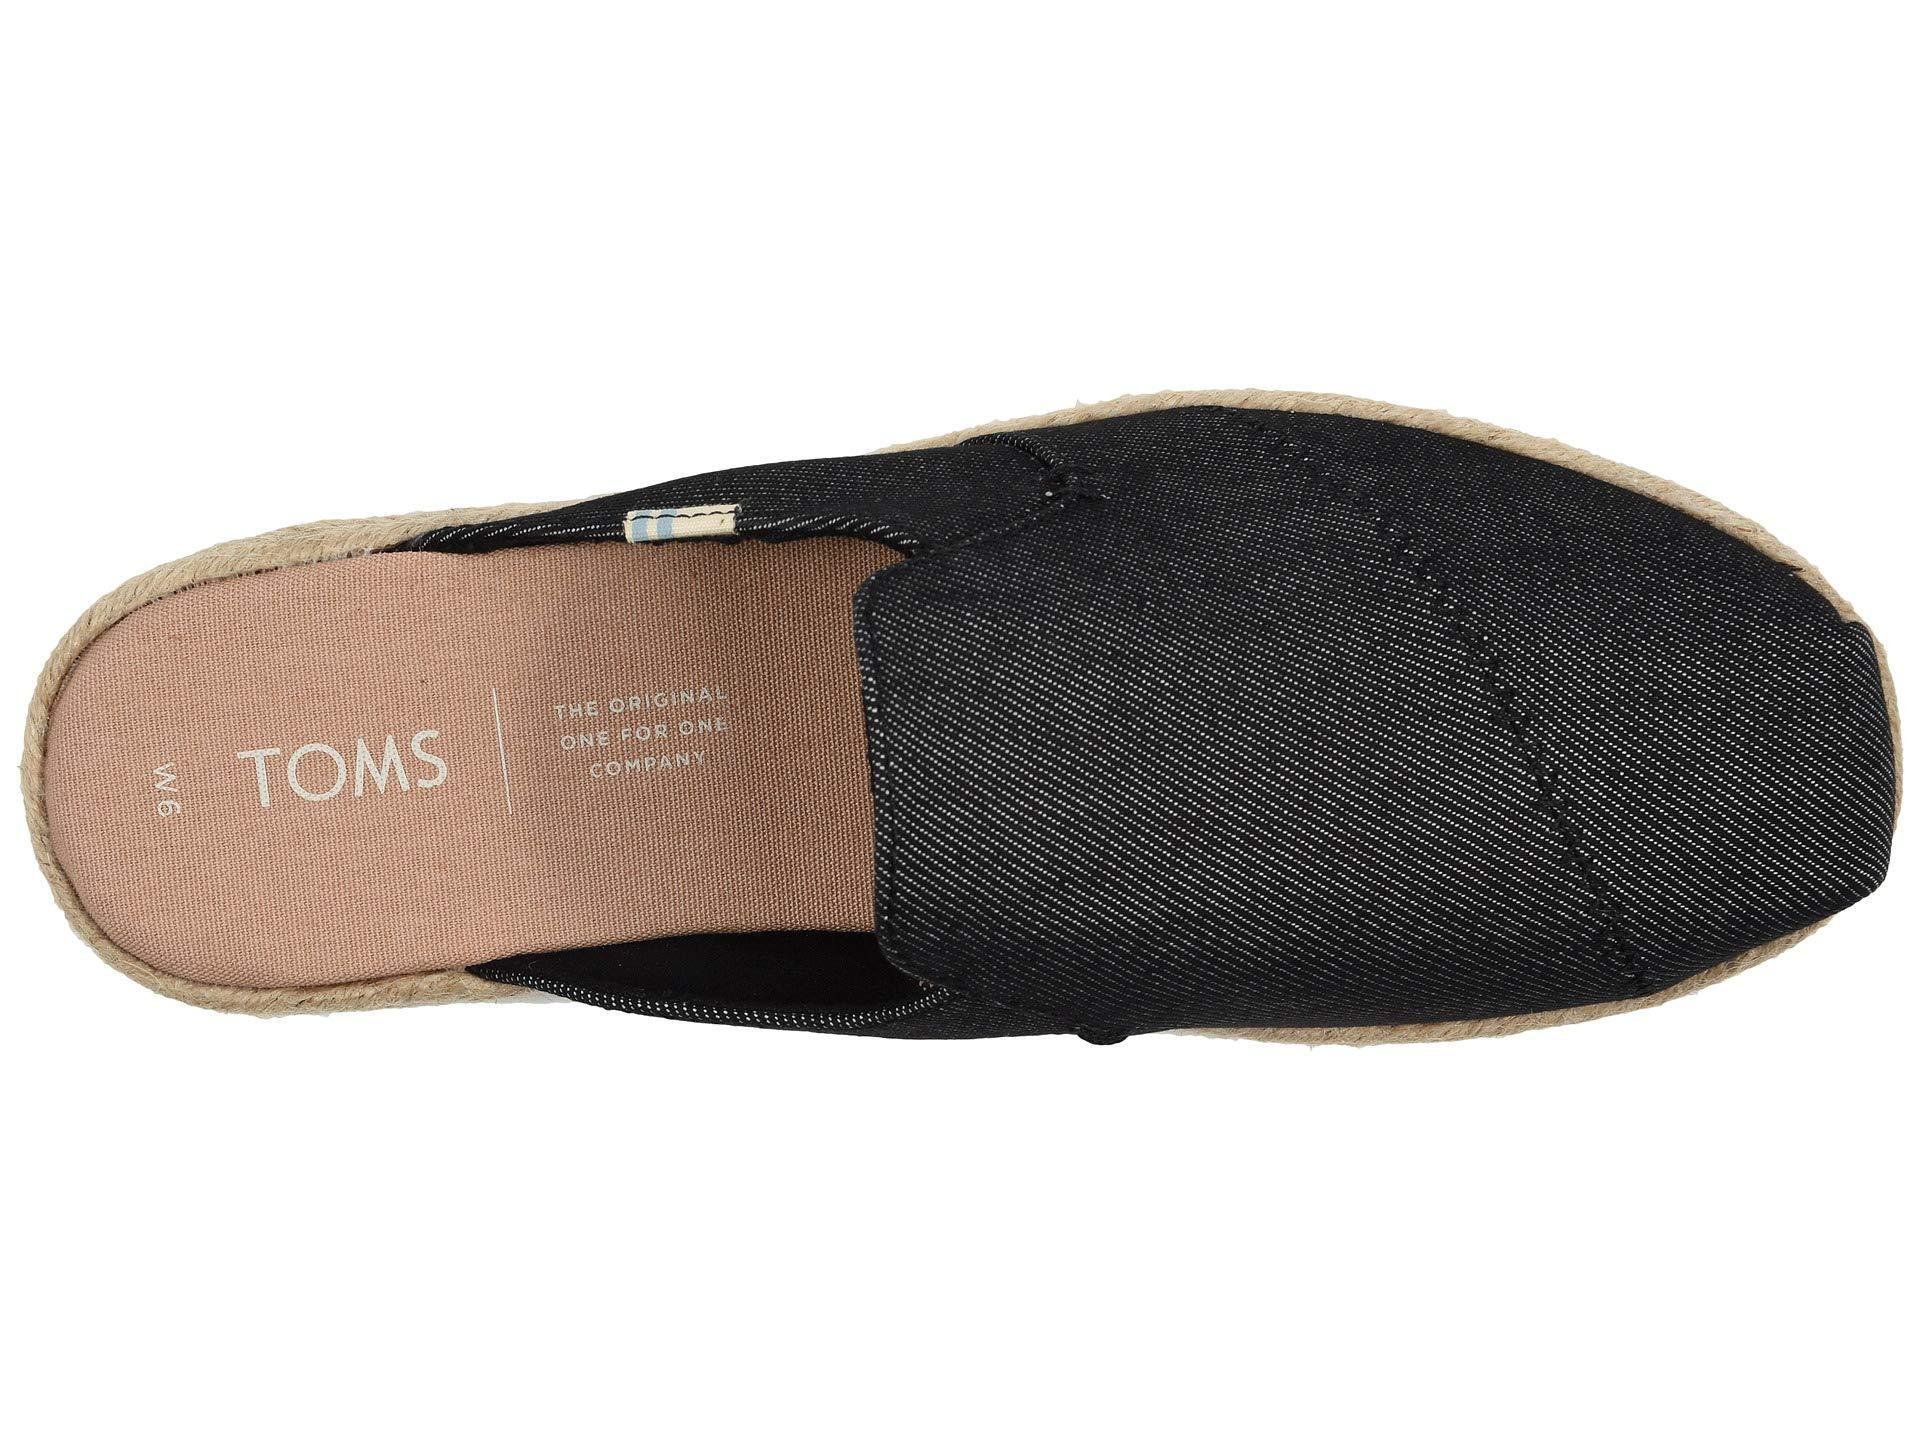 3c8e96377641 TOMS - Nova (black Denim) Women s Shoes - Lyst. View fullscreen